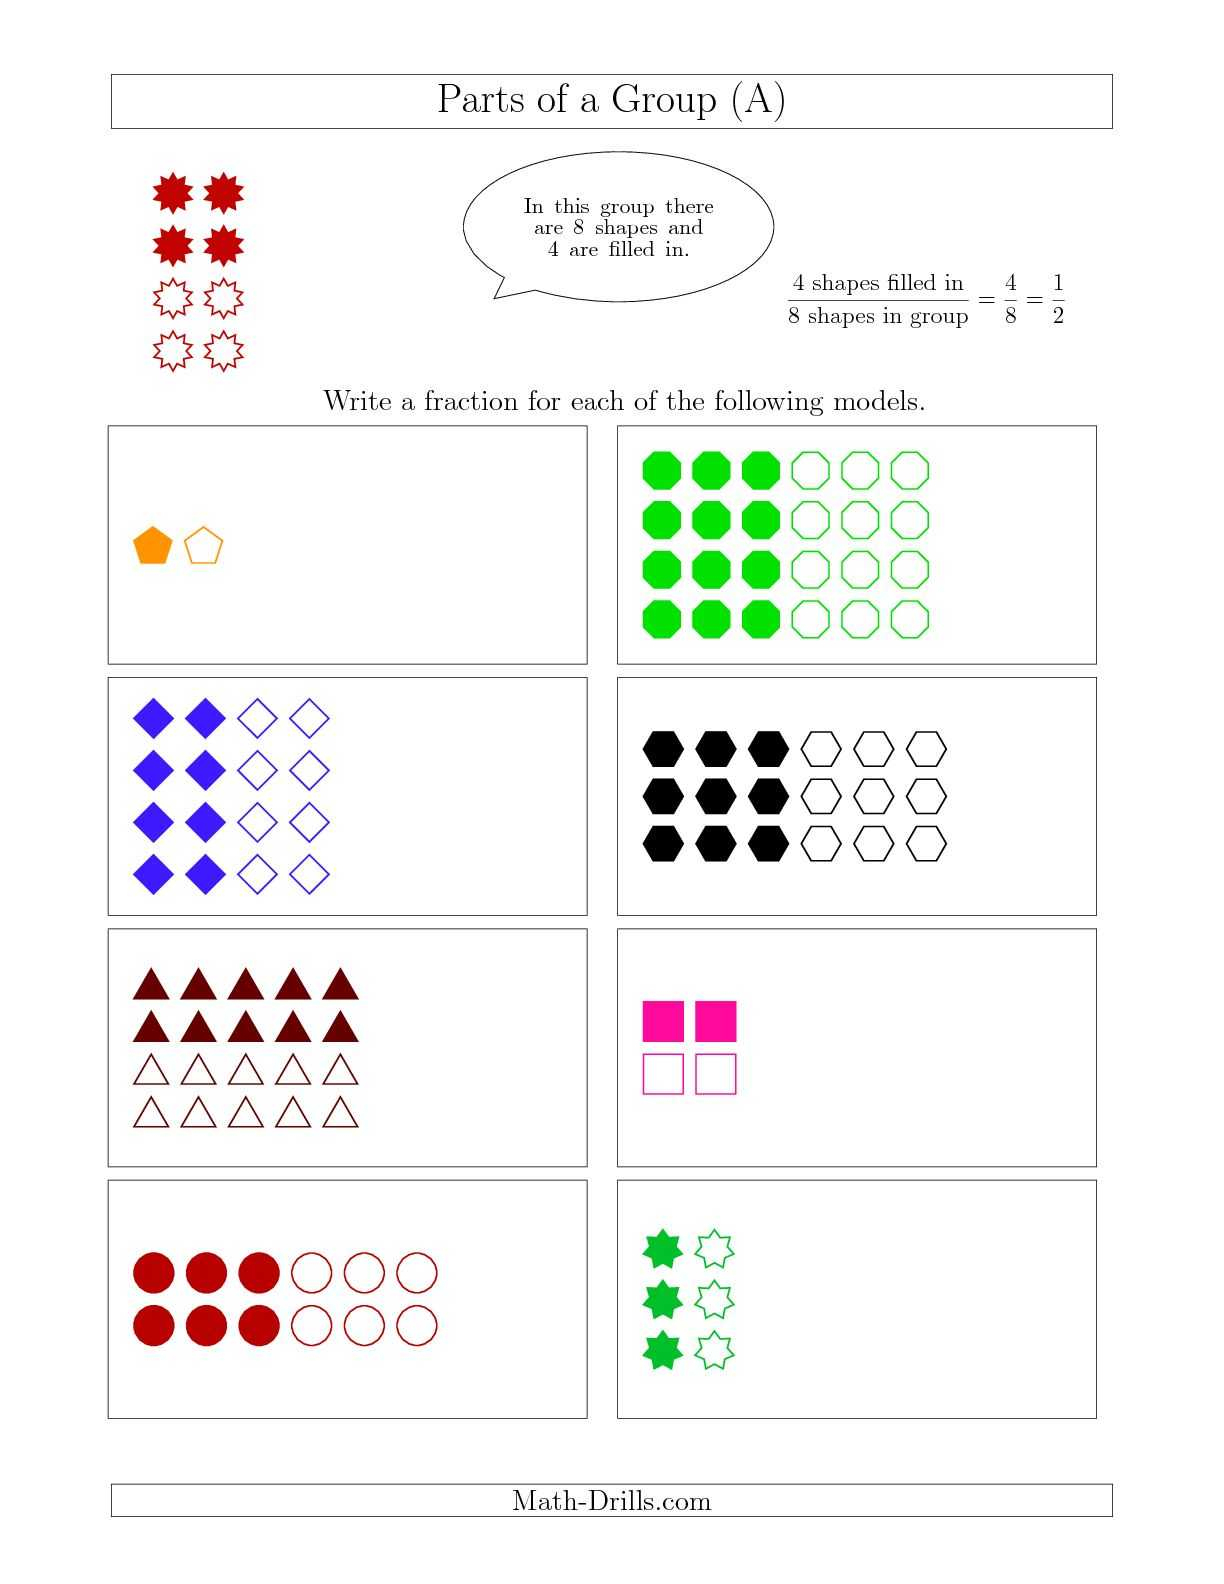 Free Printable Christmas Worksheets For Kids Together With Free - Free Printable Christmas Maths Worksheets Ks1